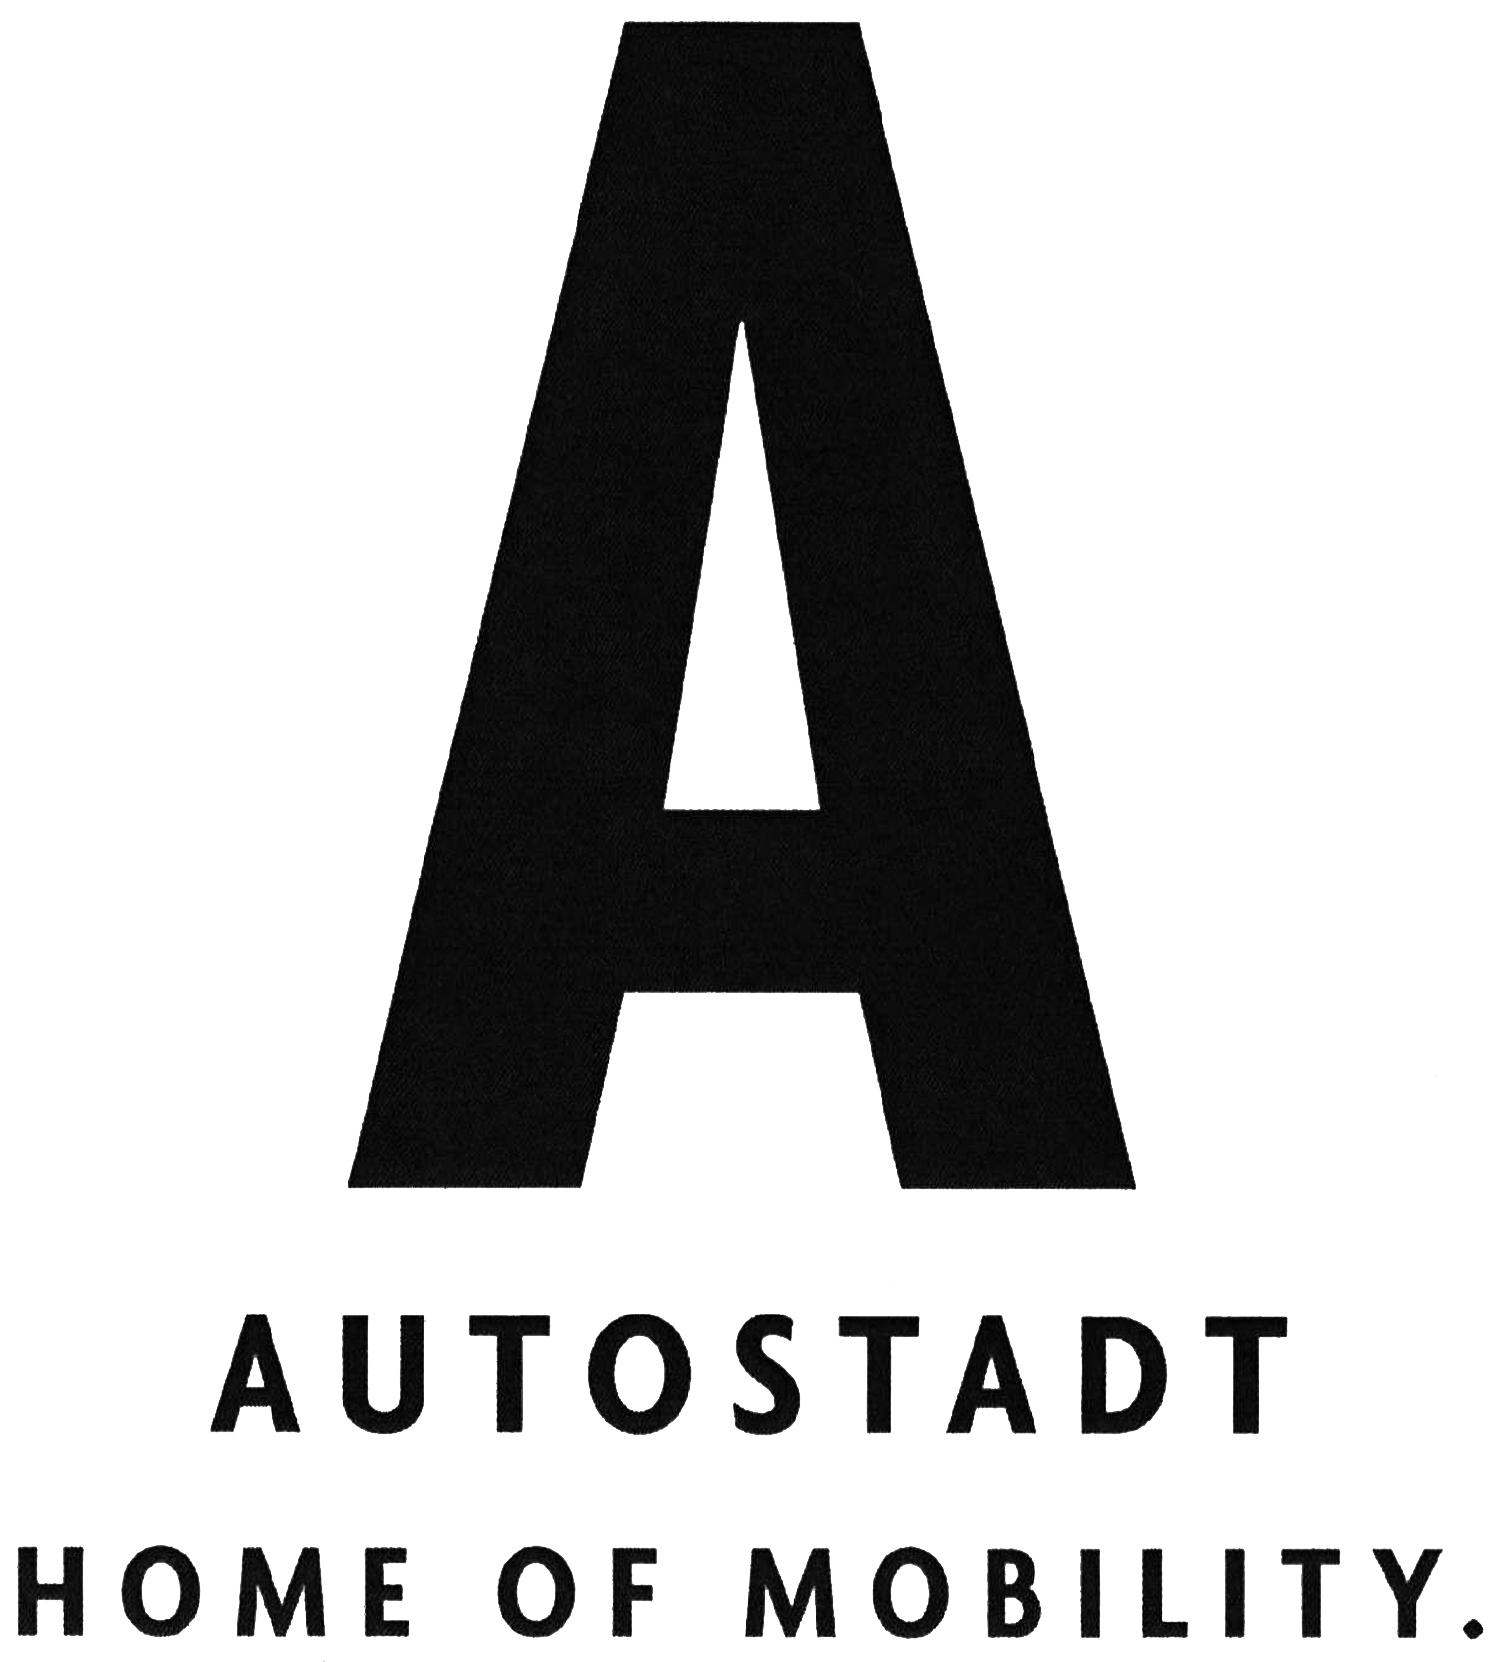 Wort-/Bildmarke: A AUTOSTADT HOME OF MOBILITY.